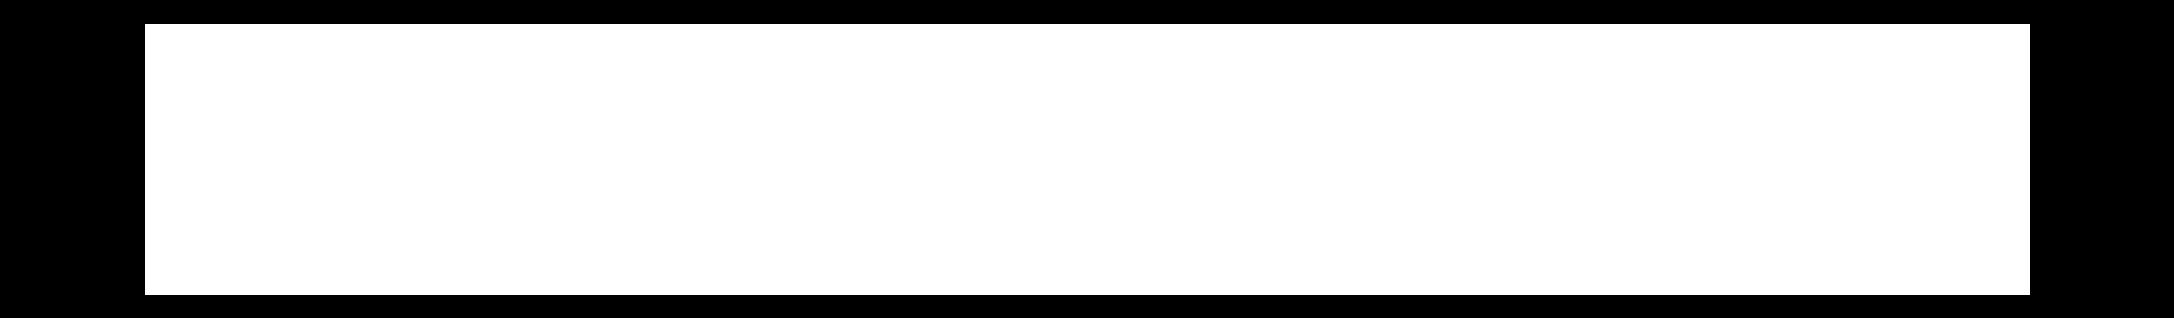 Logos of: American Dental Association, CDA, San Diego County Dental Society, Loma Linda University